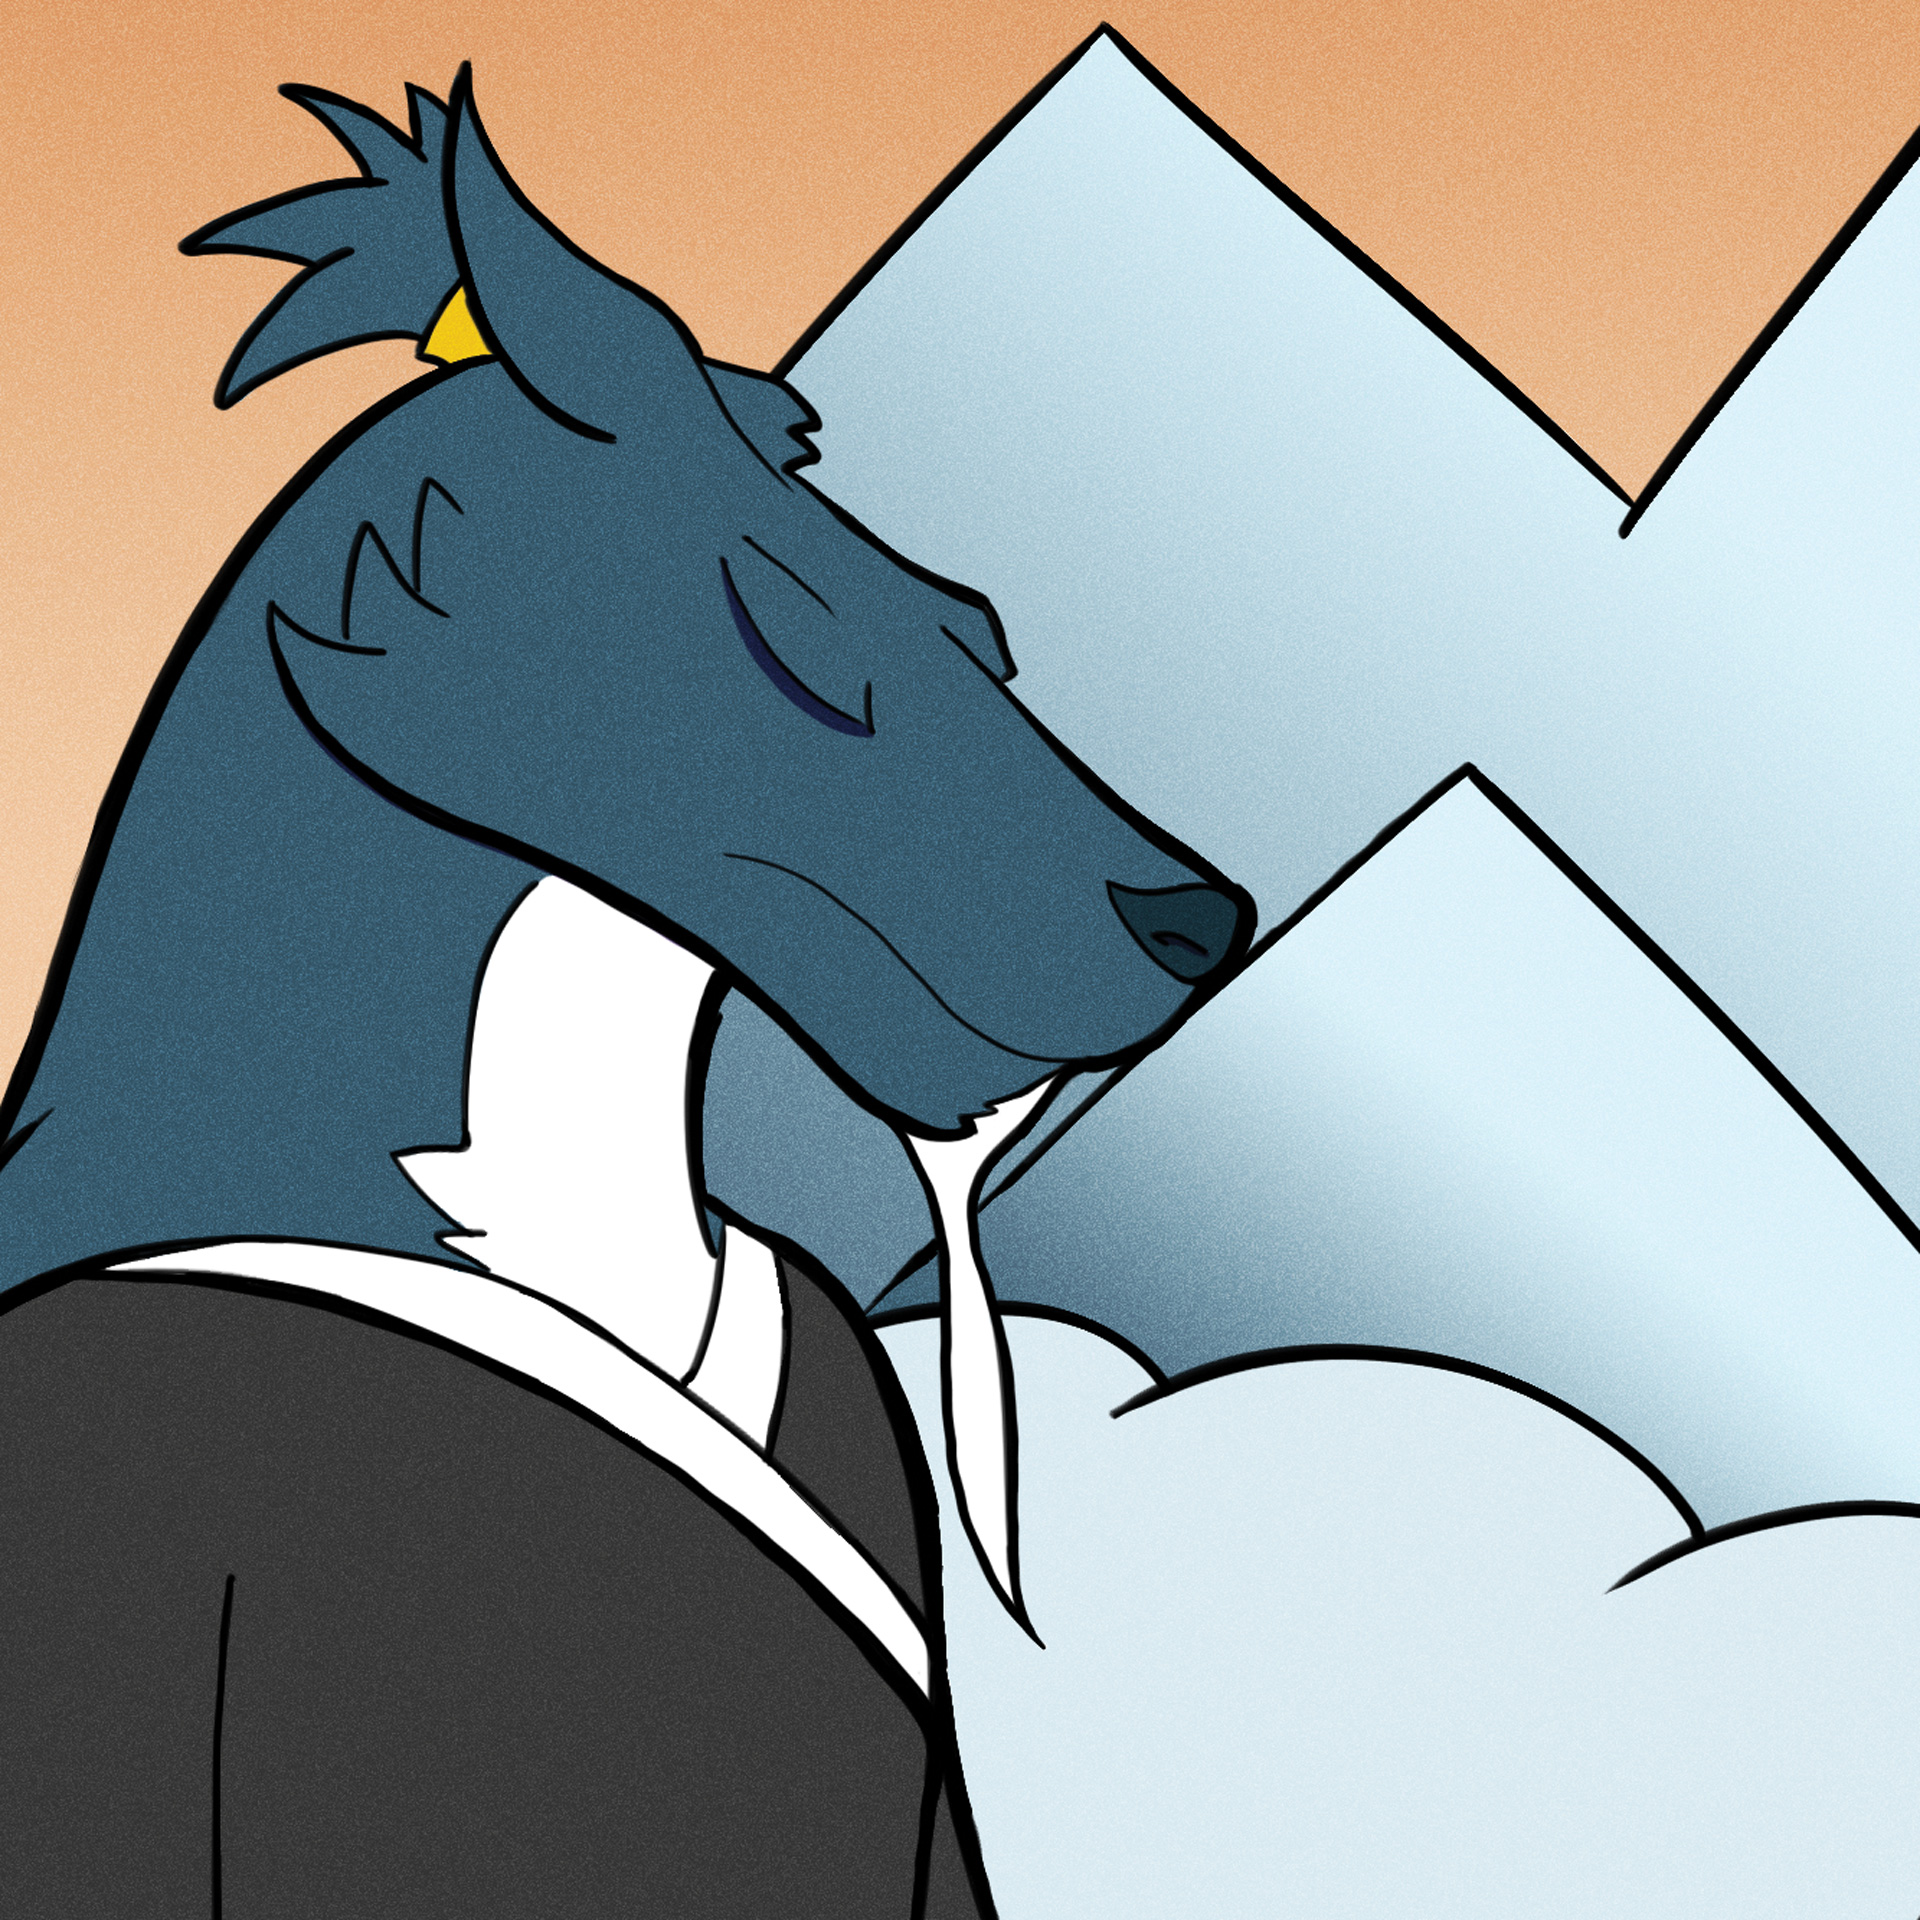 samurai-wolf-illustration-00-a.jpg